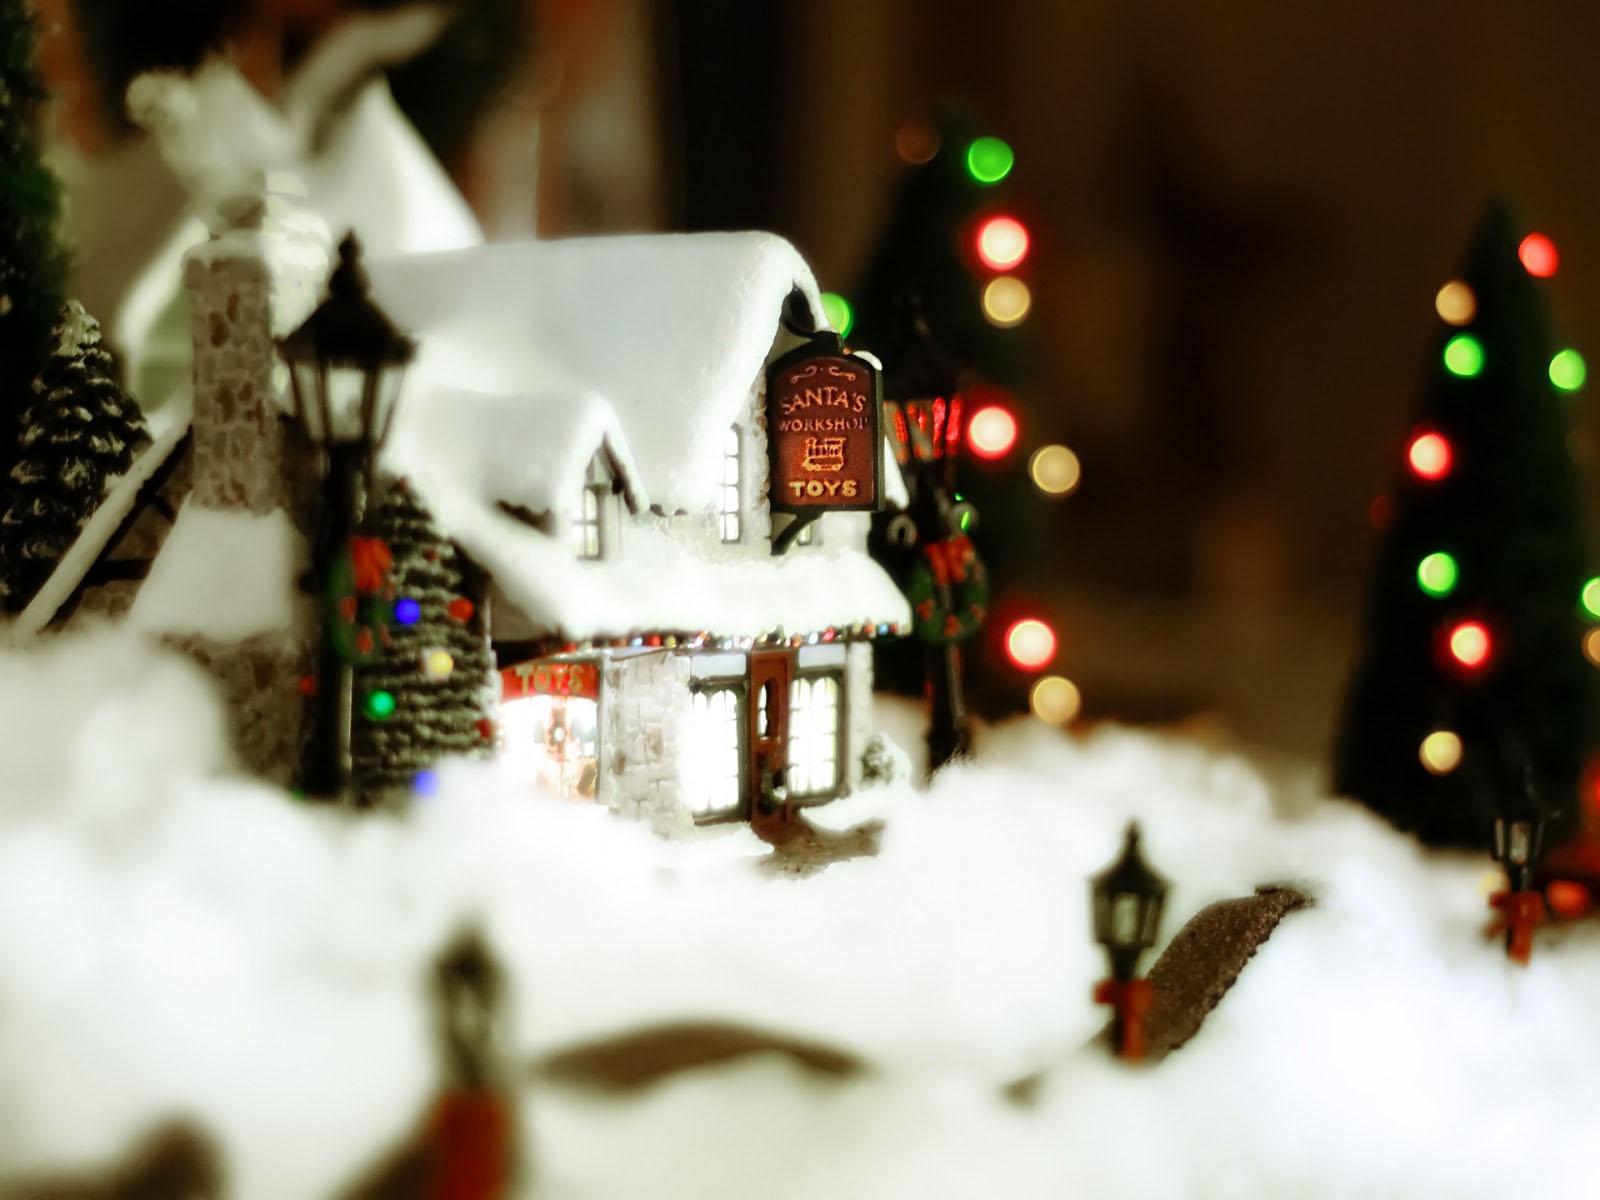 Christmas toy wallpapers salon des refus s - Christmas village wallpaper widescreen ...